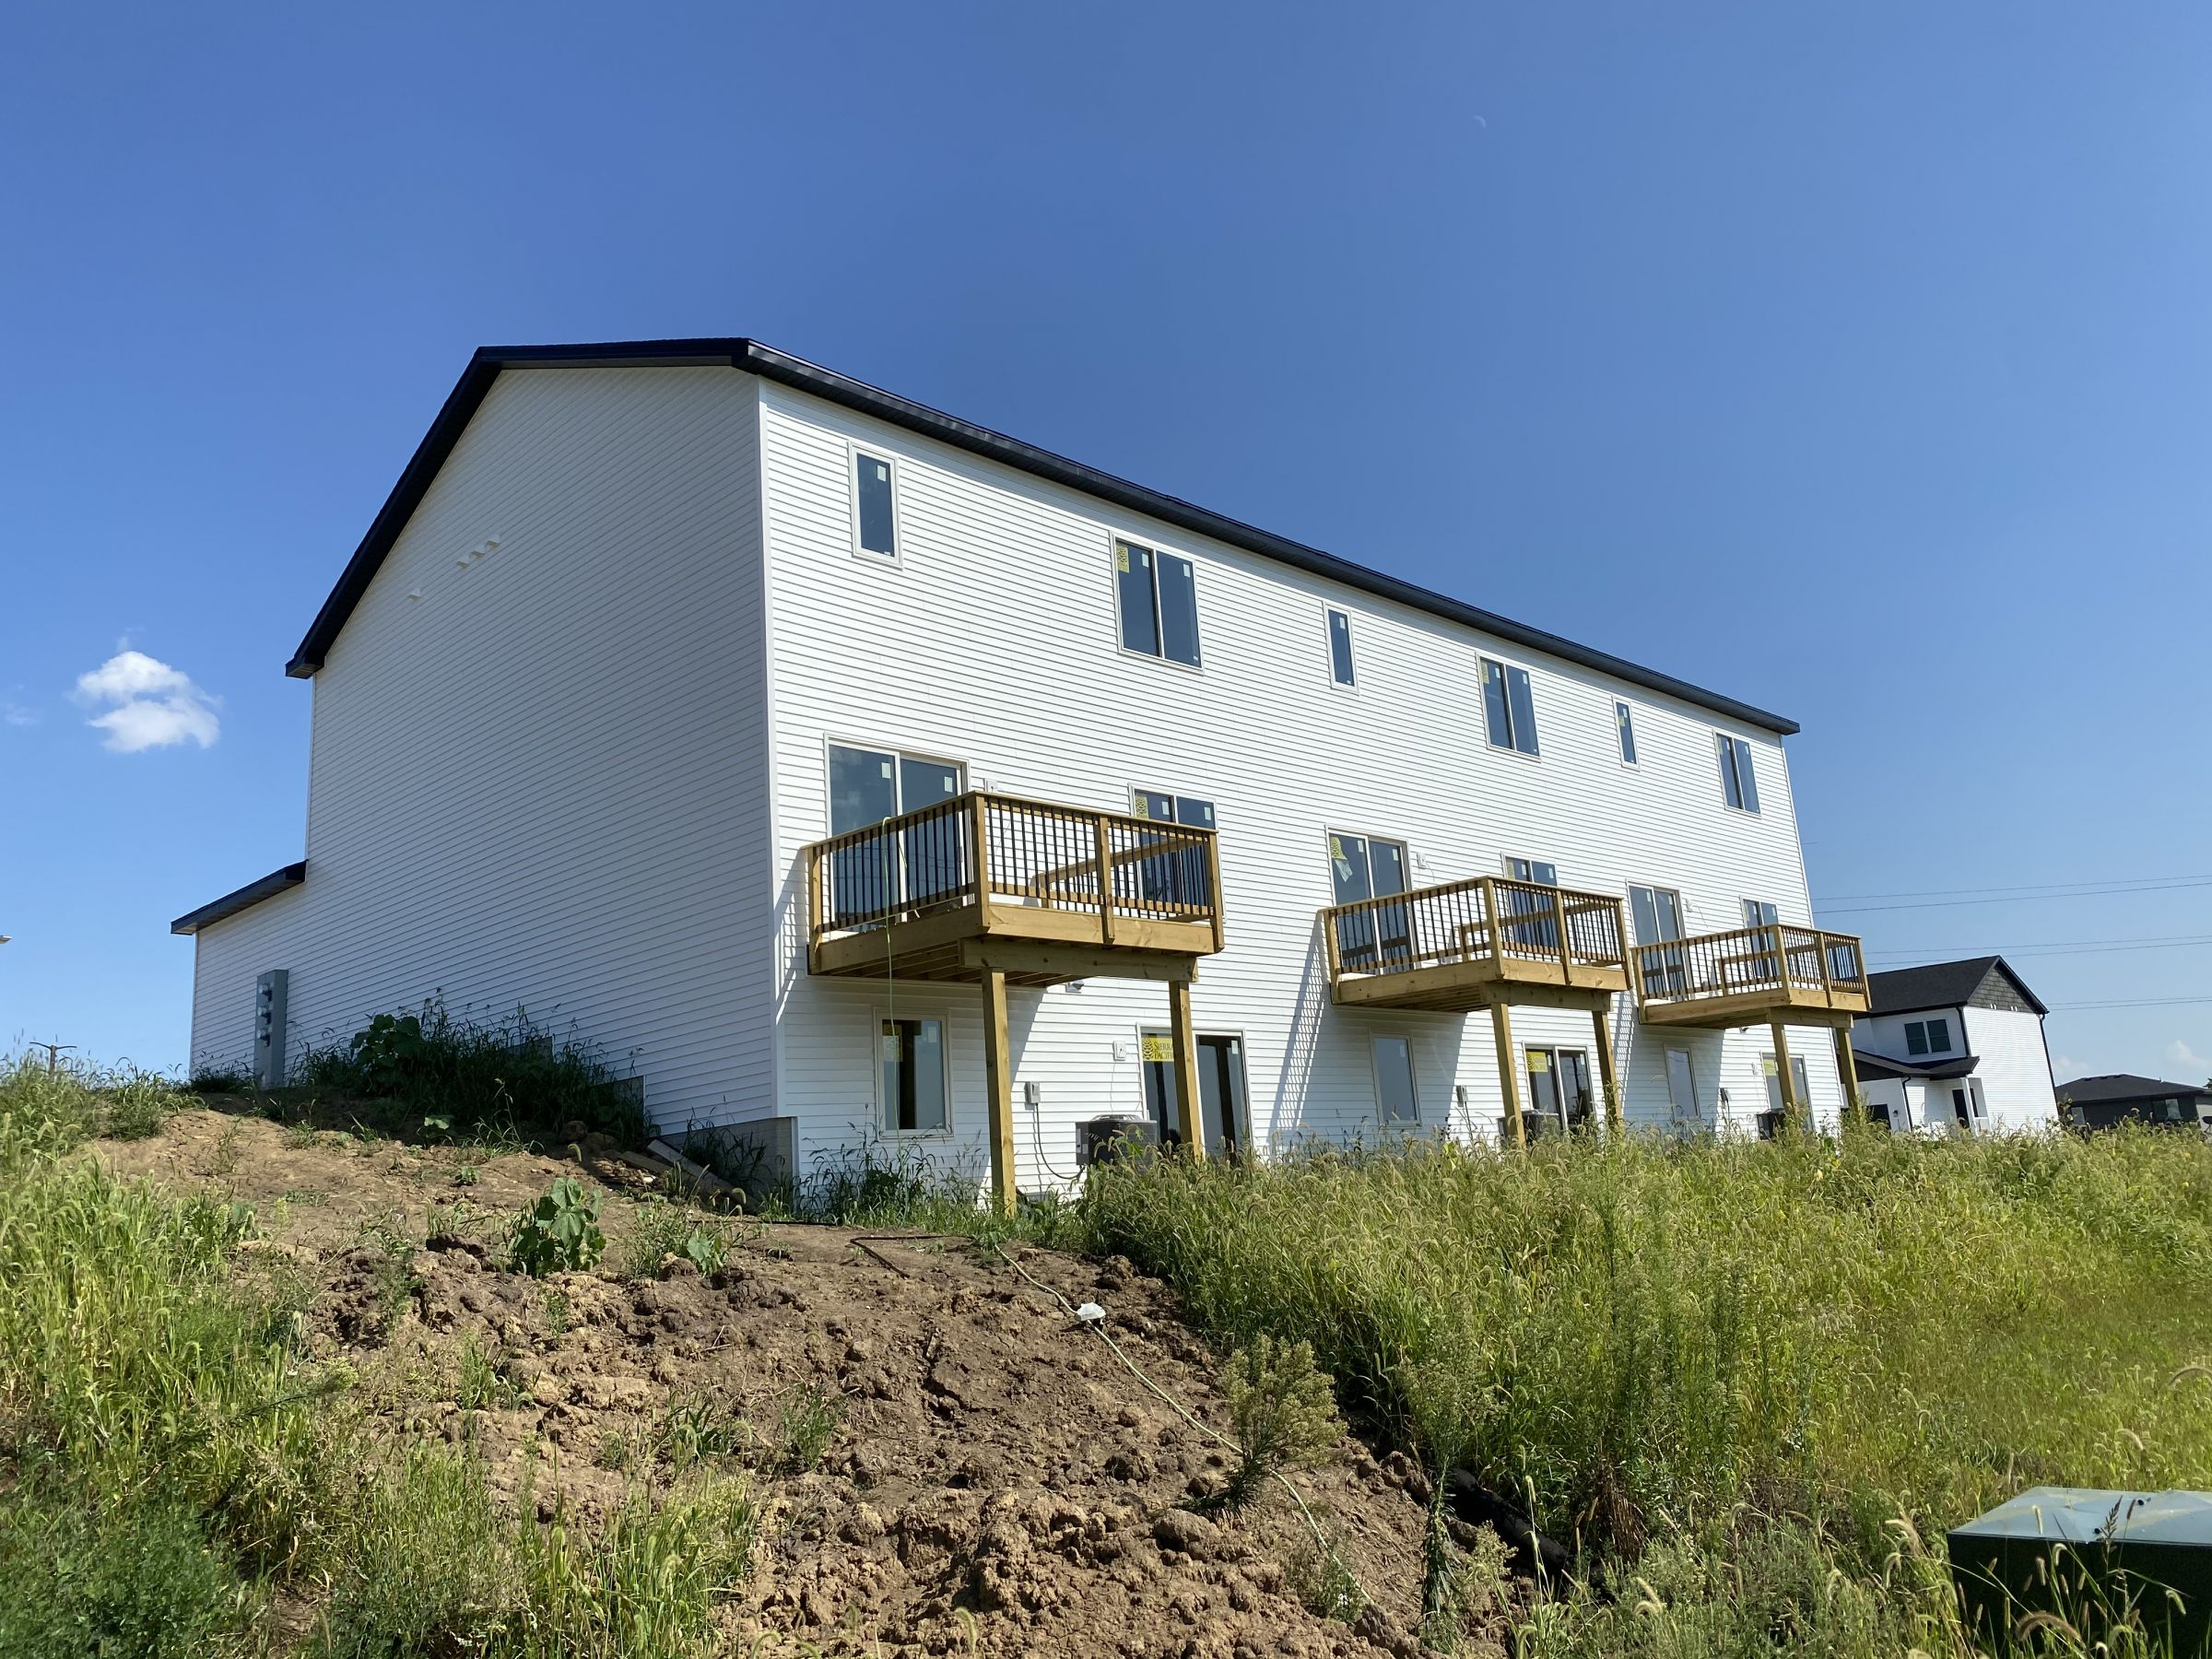 residential-warren-county-iowa-0-acres-listing-number-15134-0-2020-08-26-184911.jpg